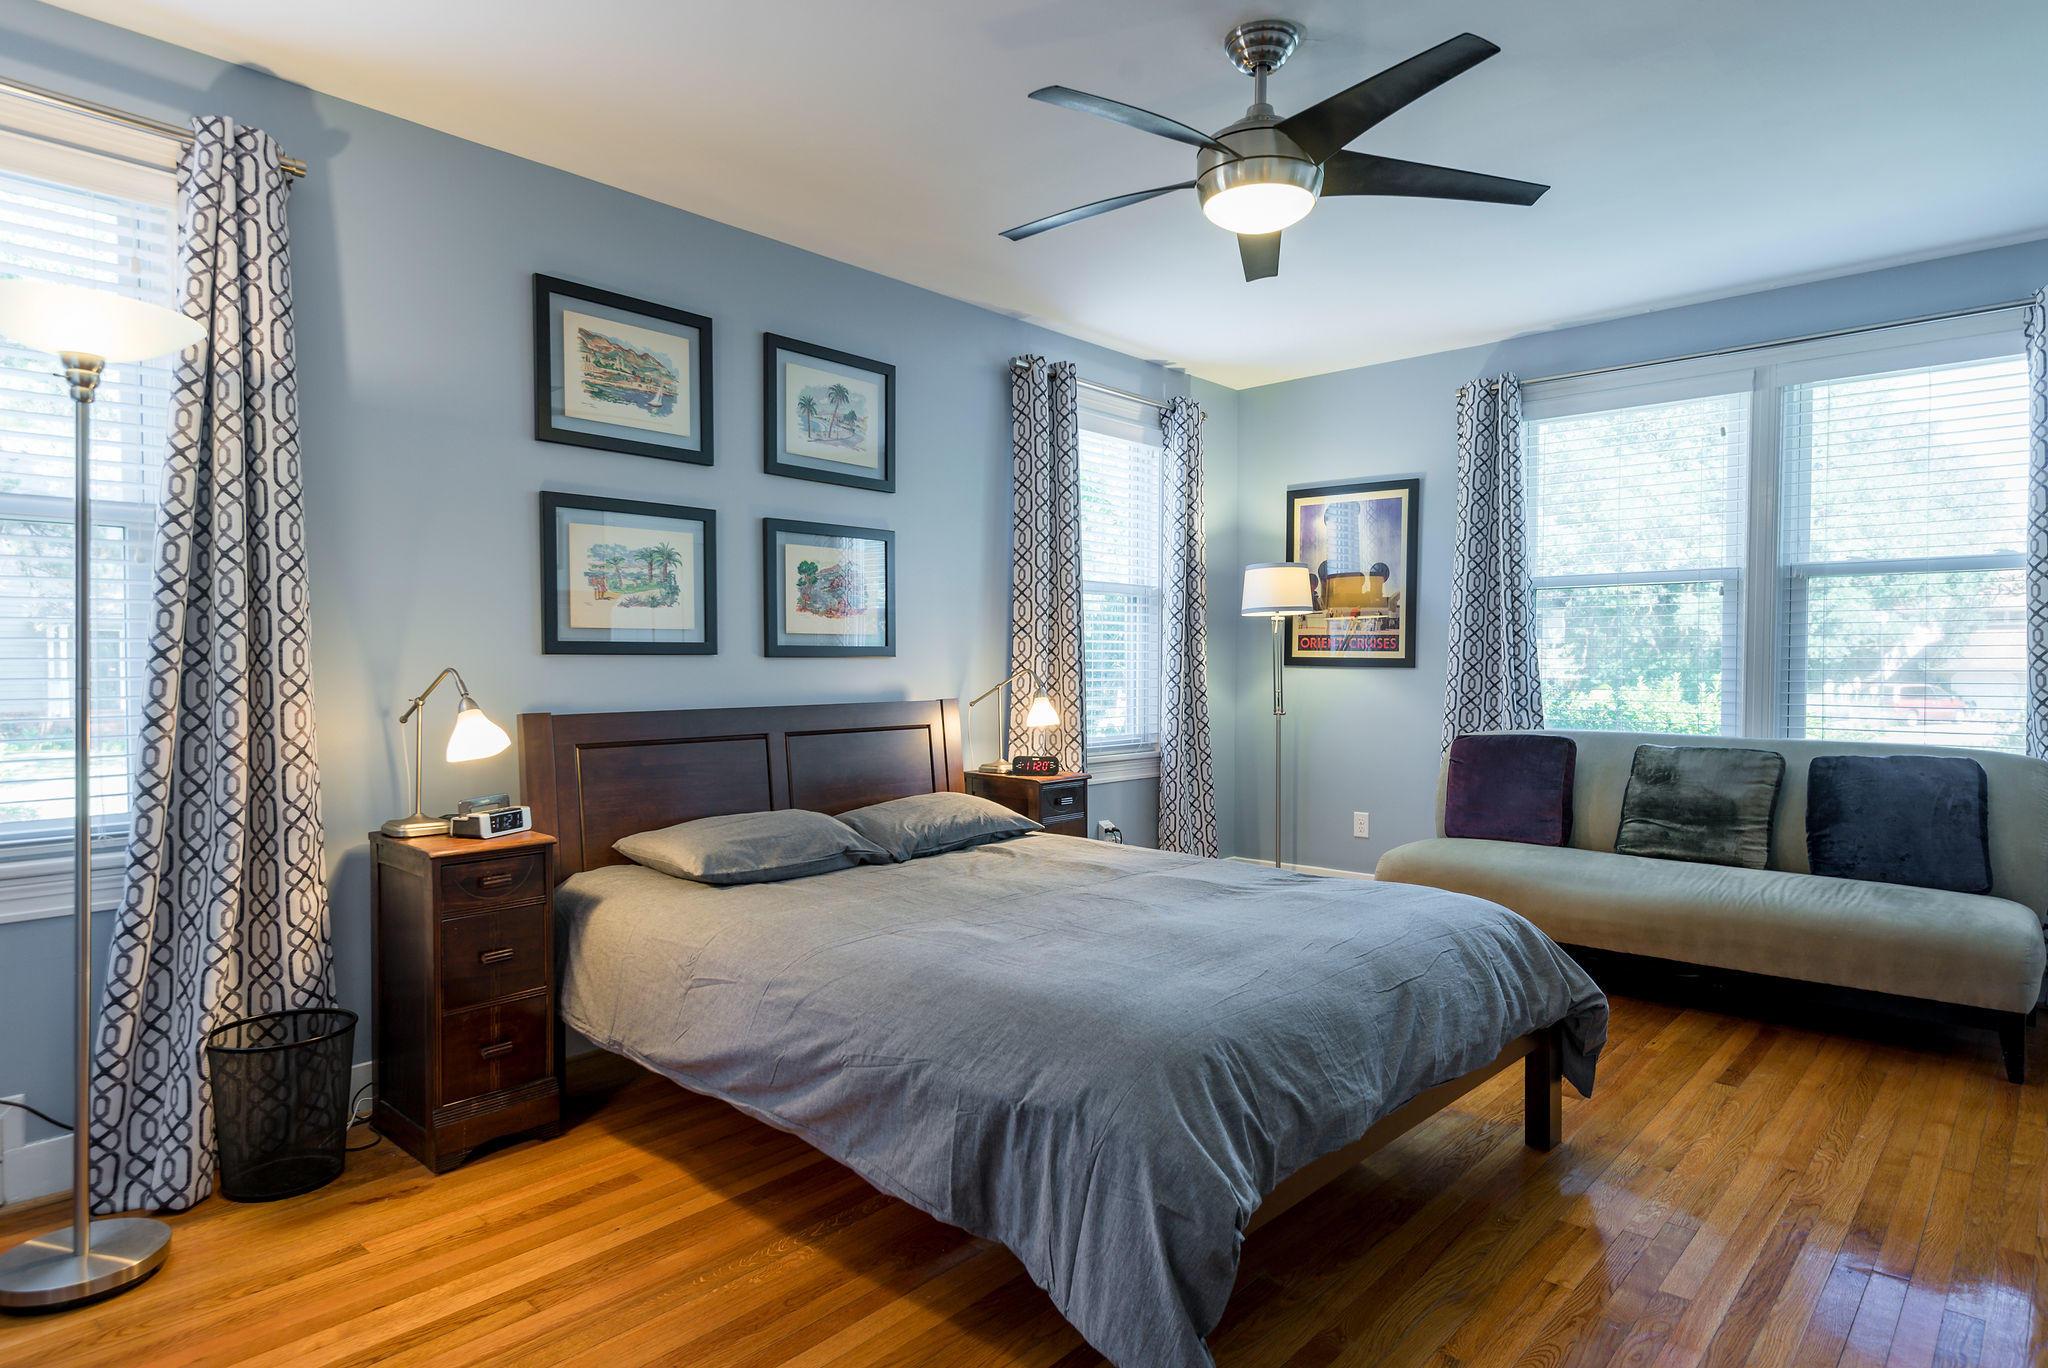 Sylvan Shores Homes For Sale - 450 Polony, Charleston, SC - 29